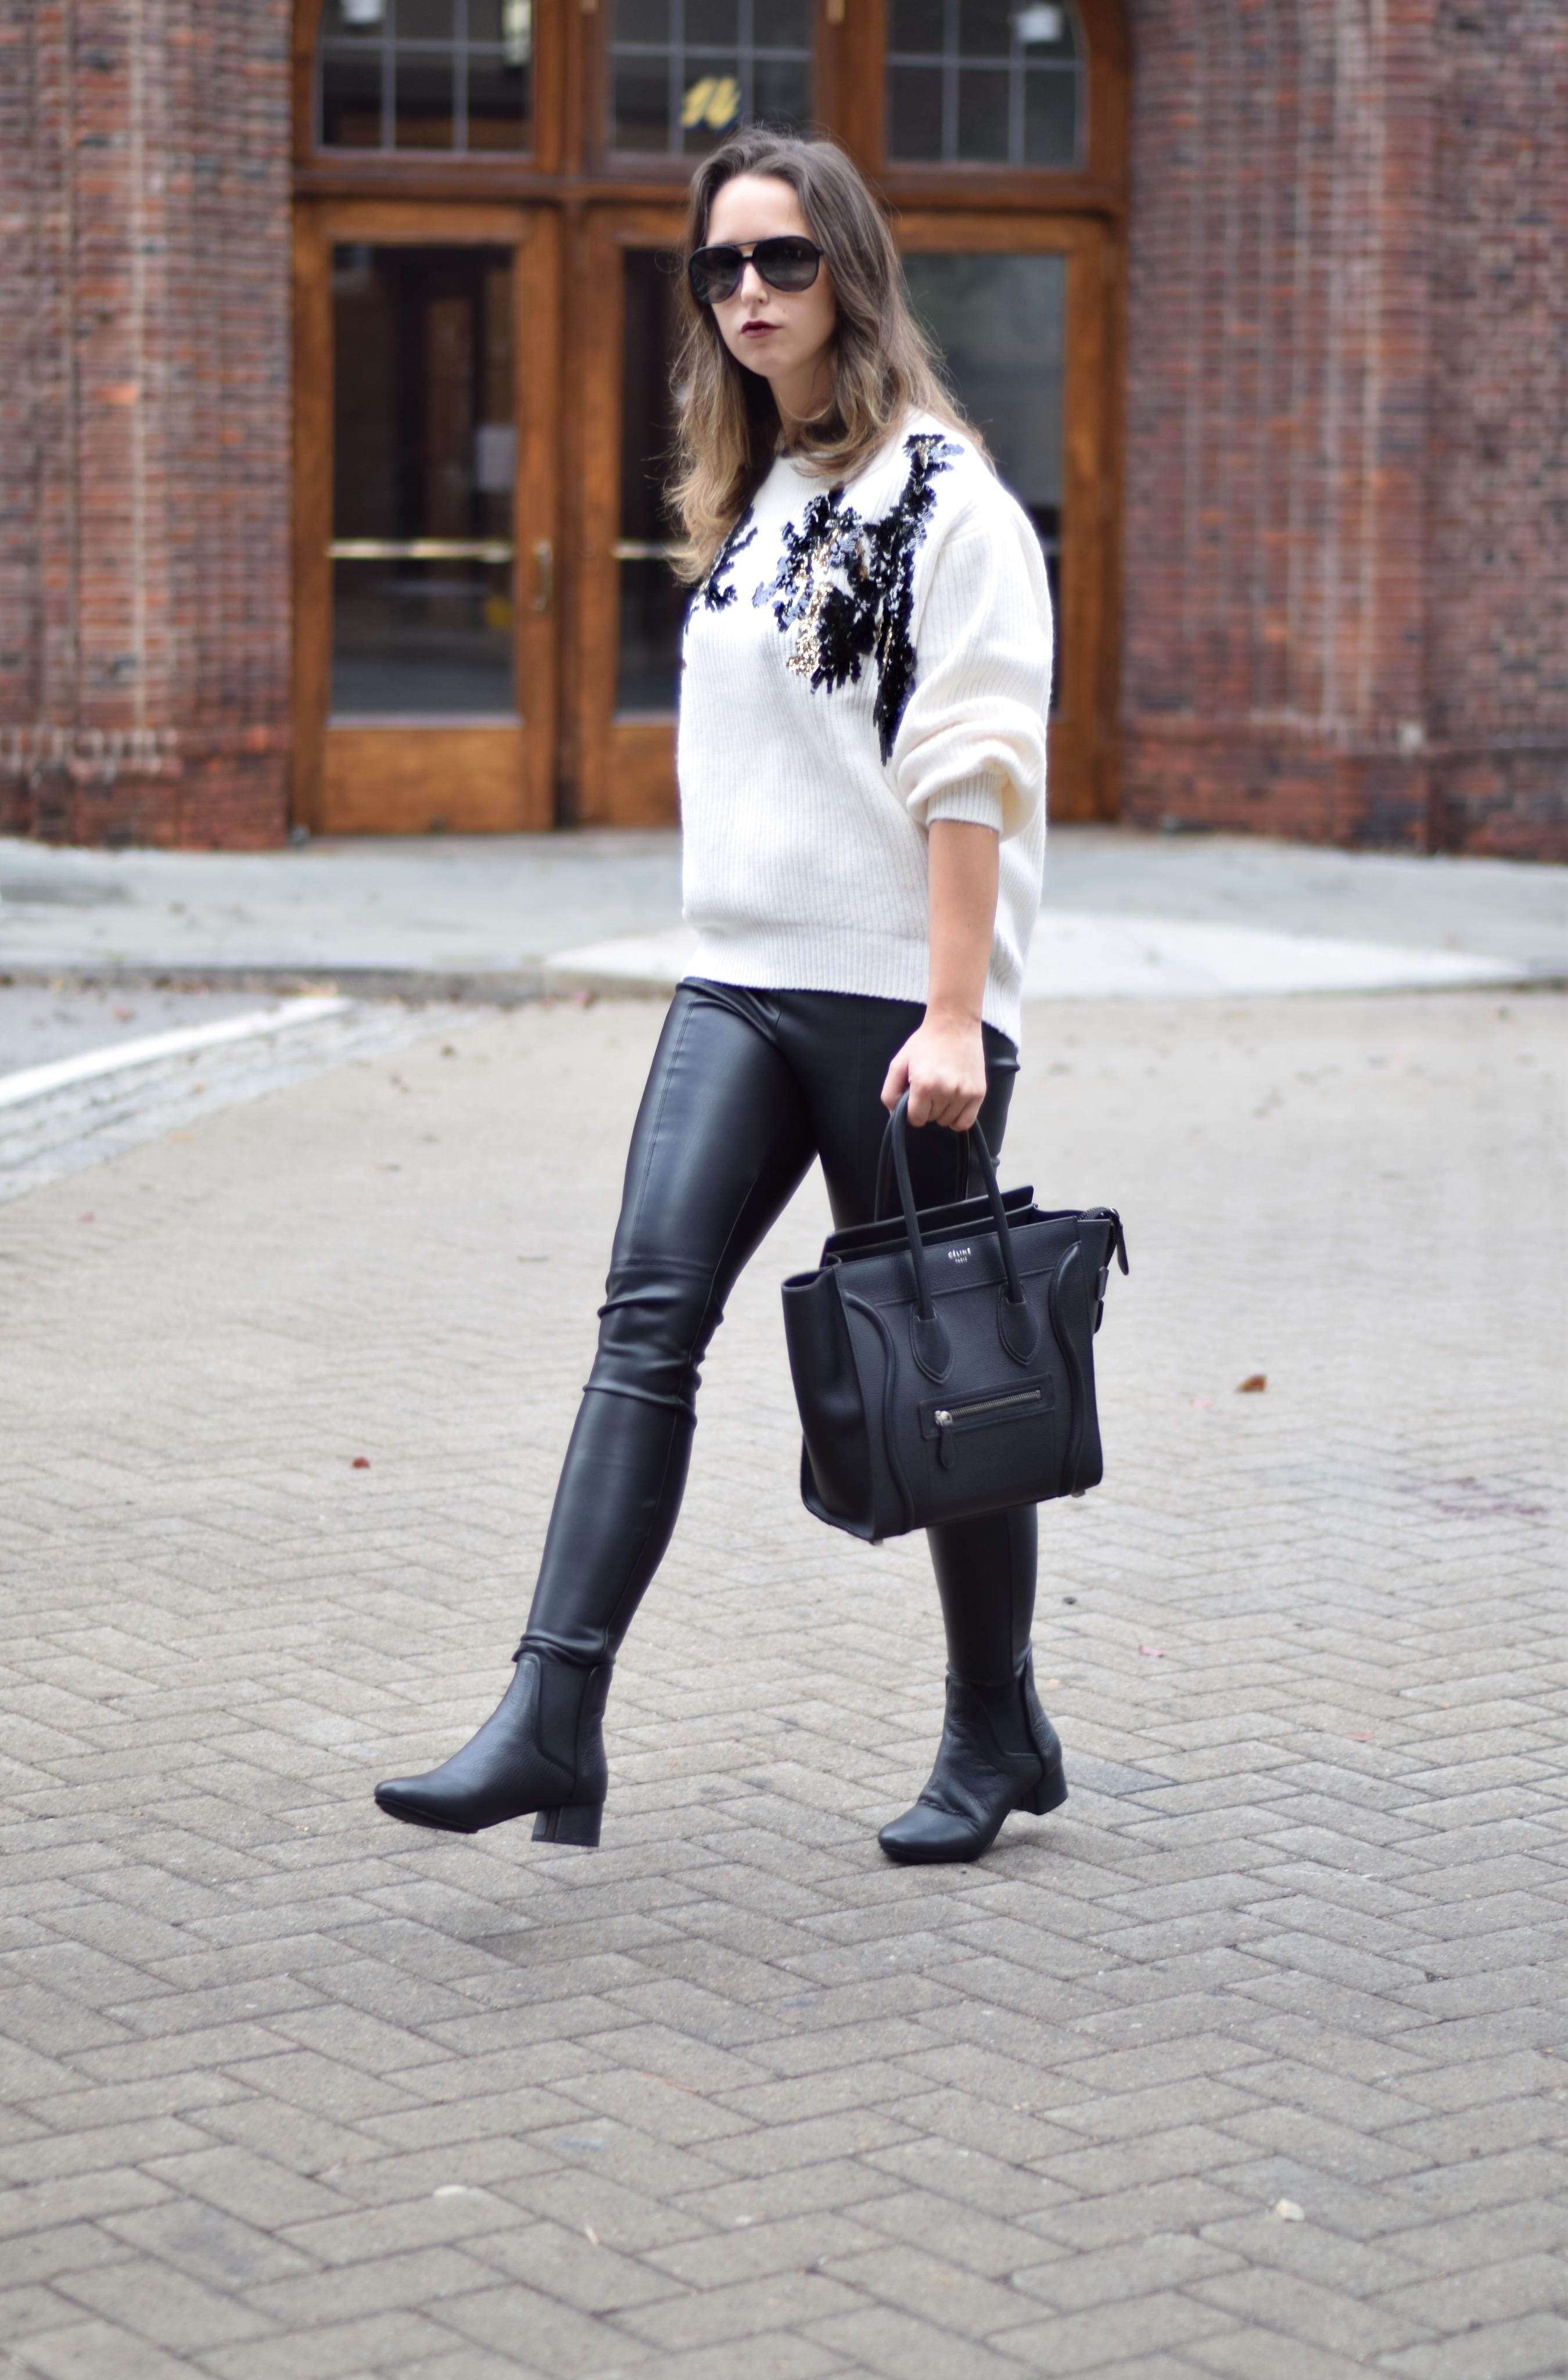 yosi samra-booties-style-street style-new york